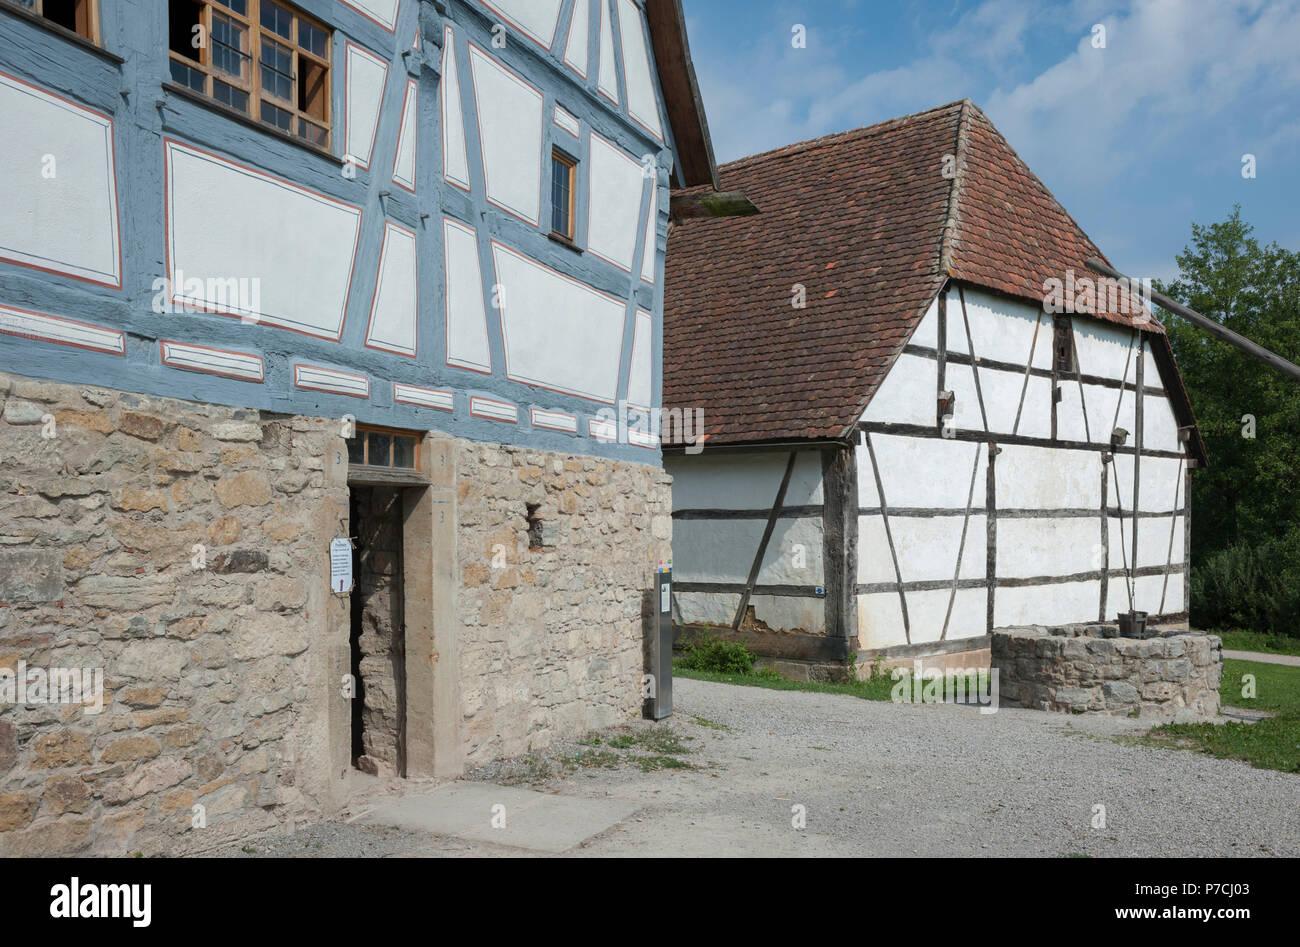 open-air museum, wackershofen, schwaebisch hall, Hohenlohe region, Baden-Wuerttemberg, Heilbronn-Franconia, Germany - Stock Image